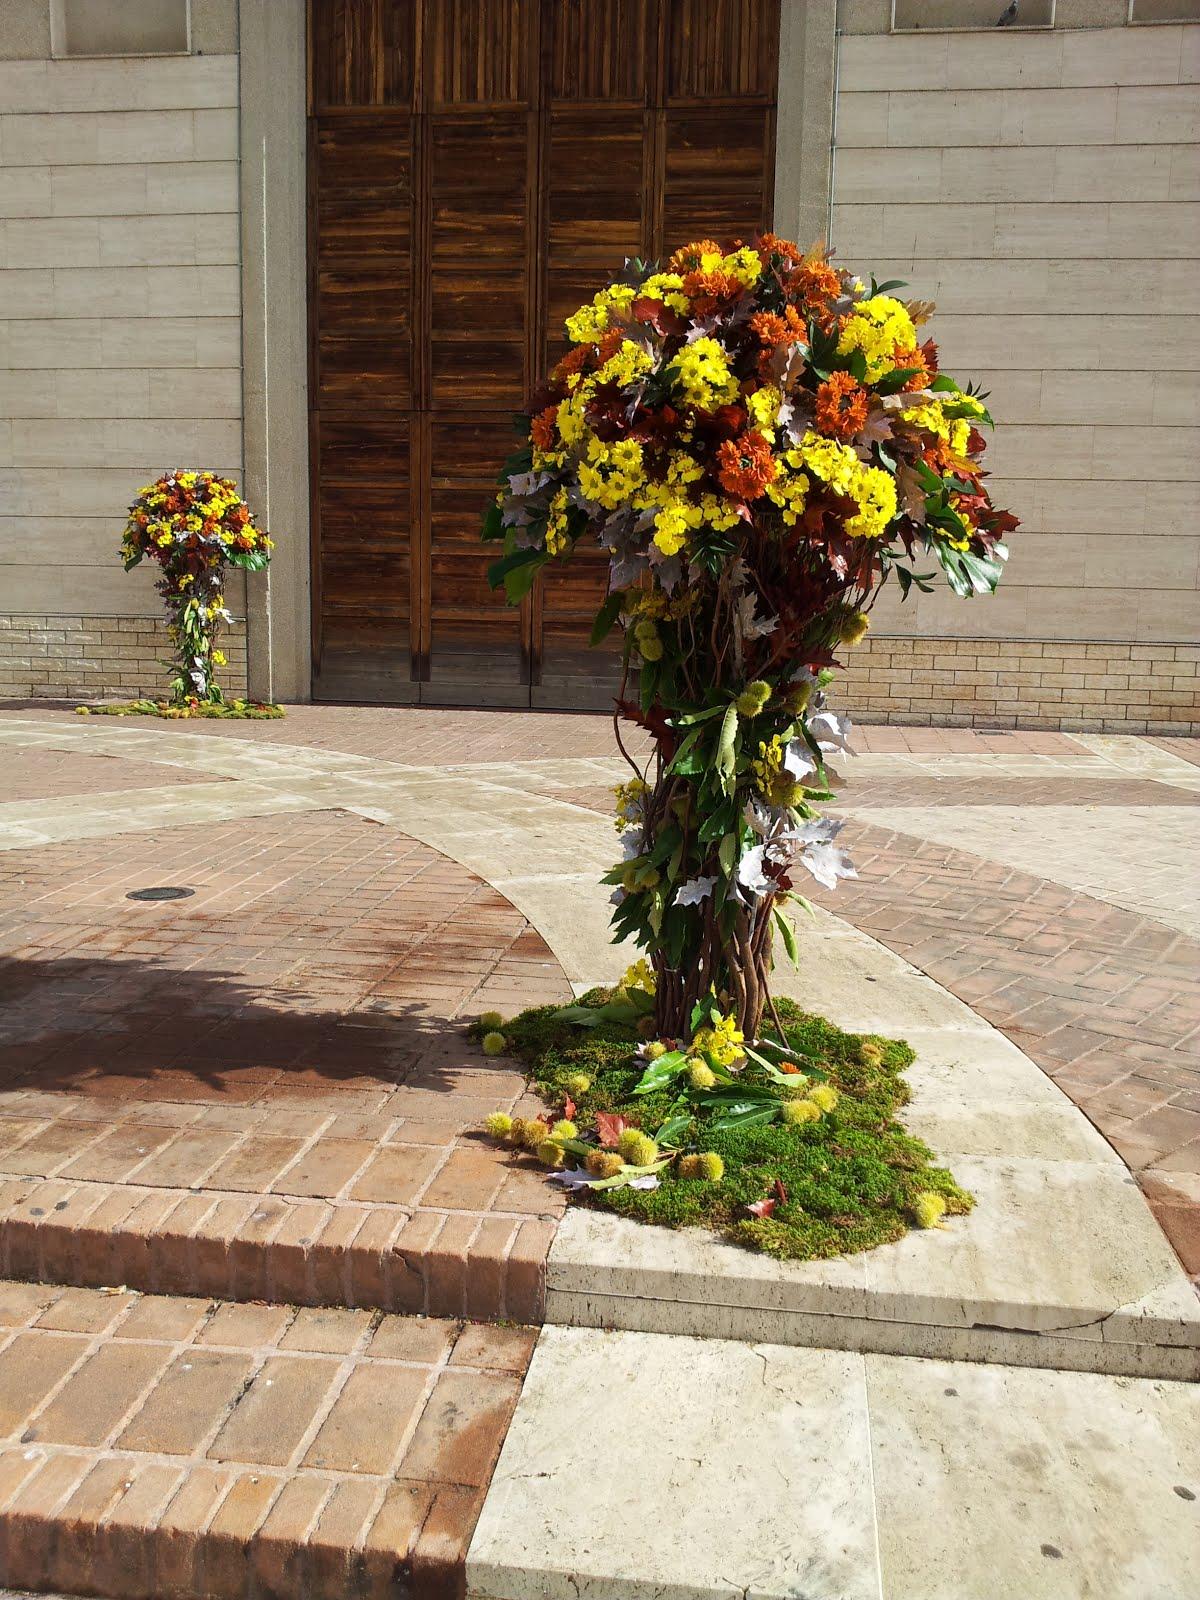 composizioni floreali matrimonio a tema autunnale